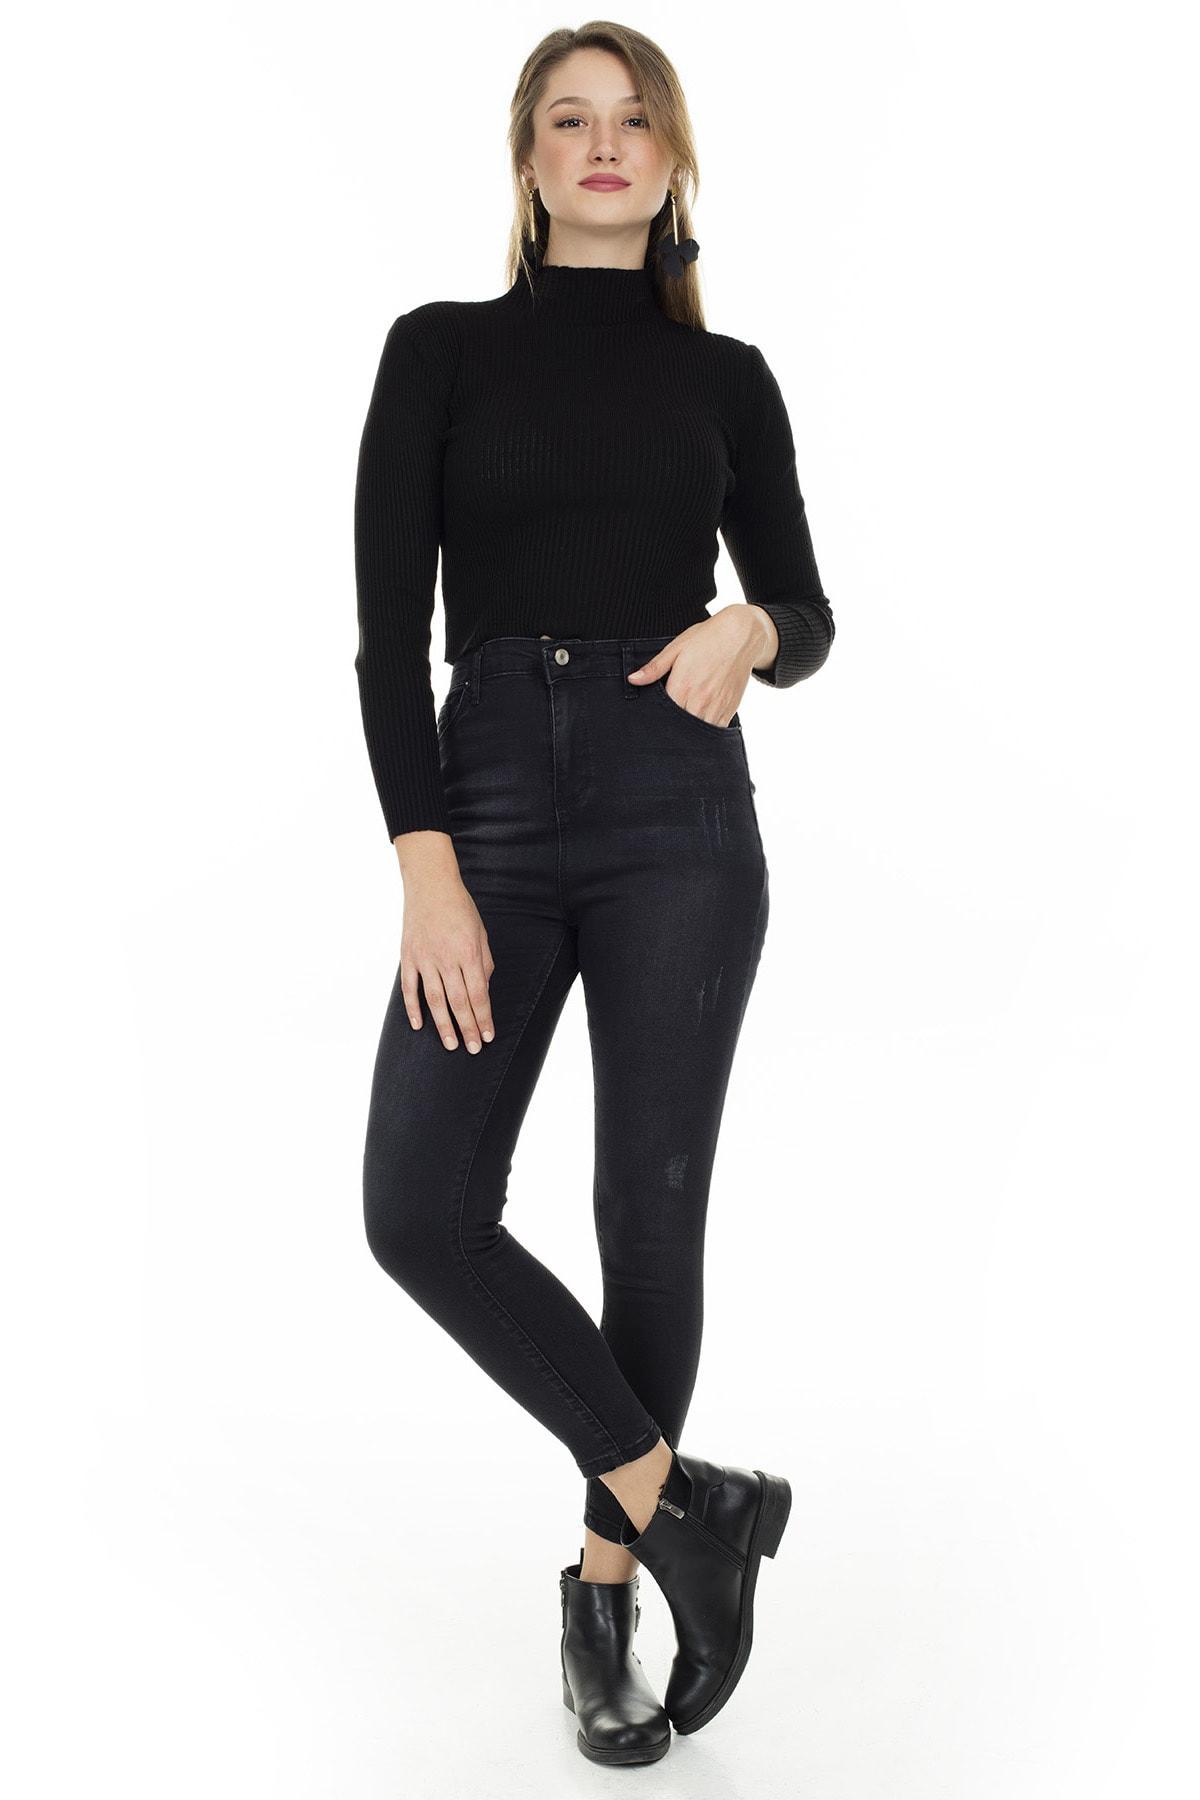 Lela Yüksek Bel Skinny Jeans KADIN KOT PANTOLON 58713263